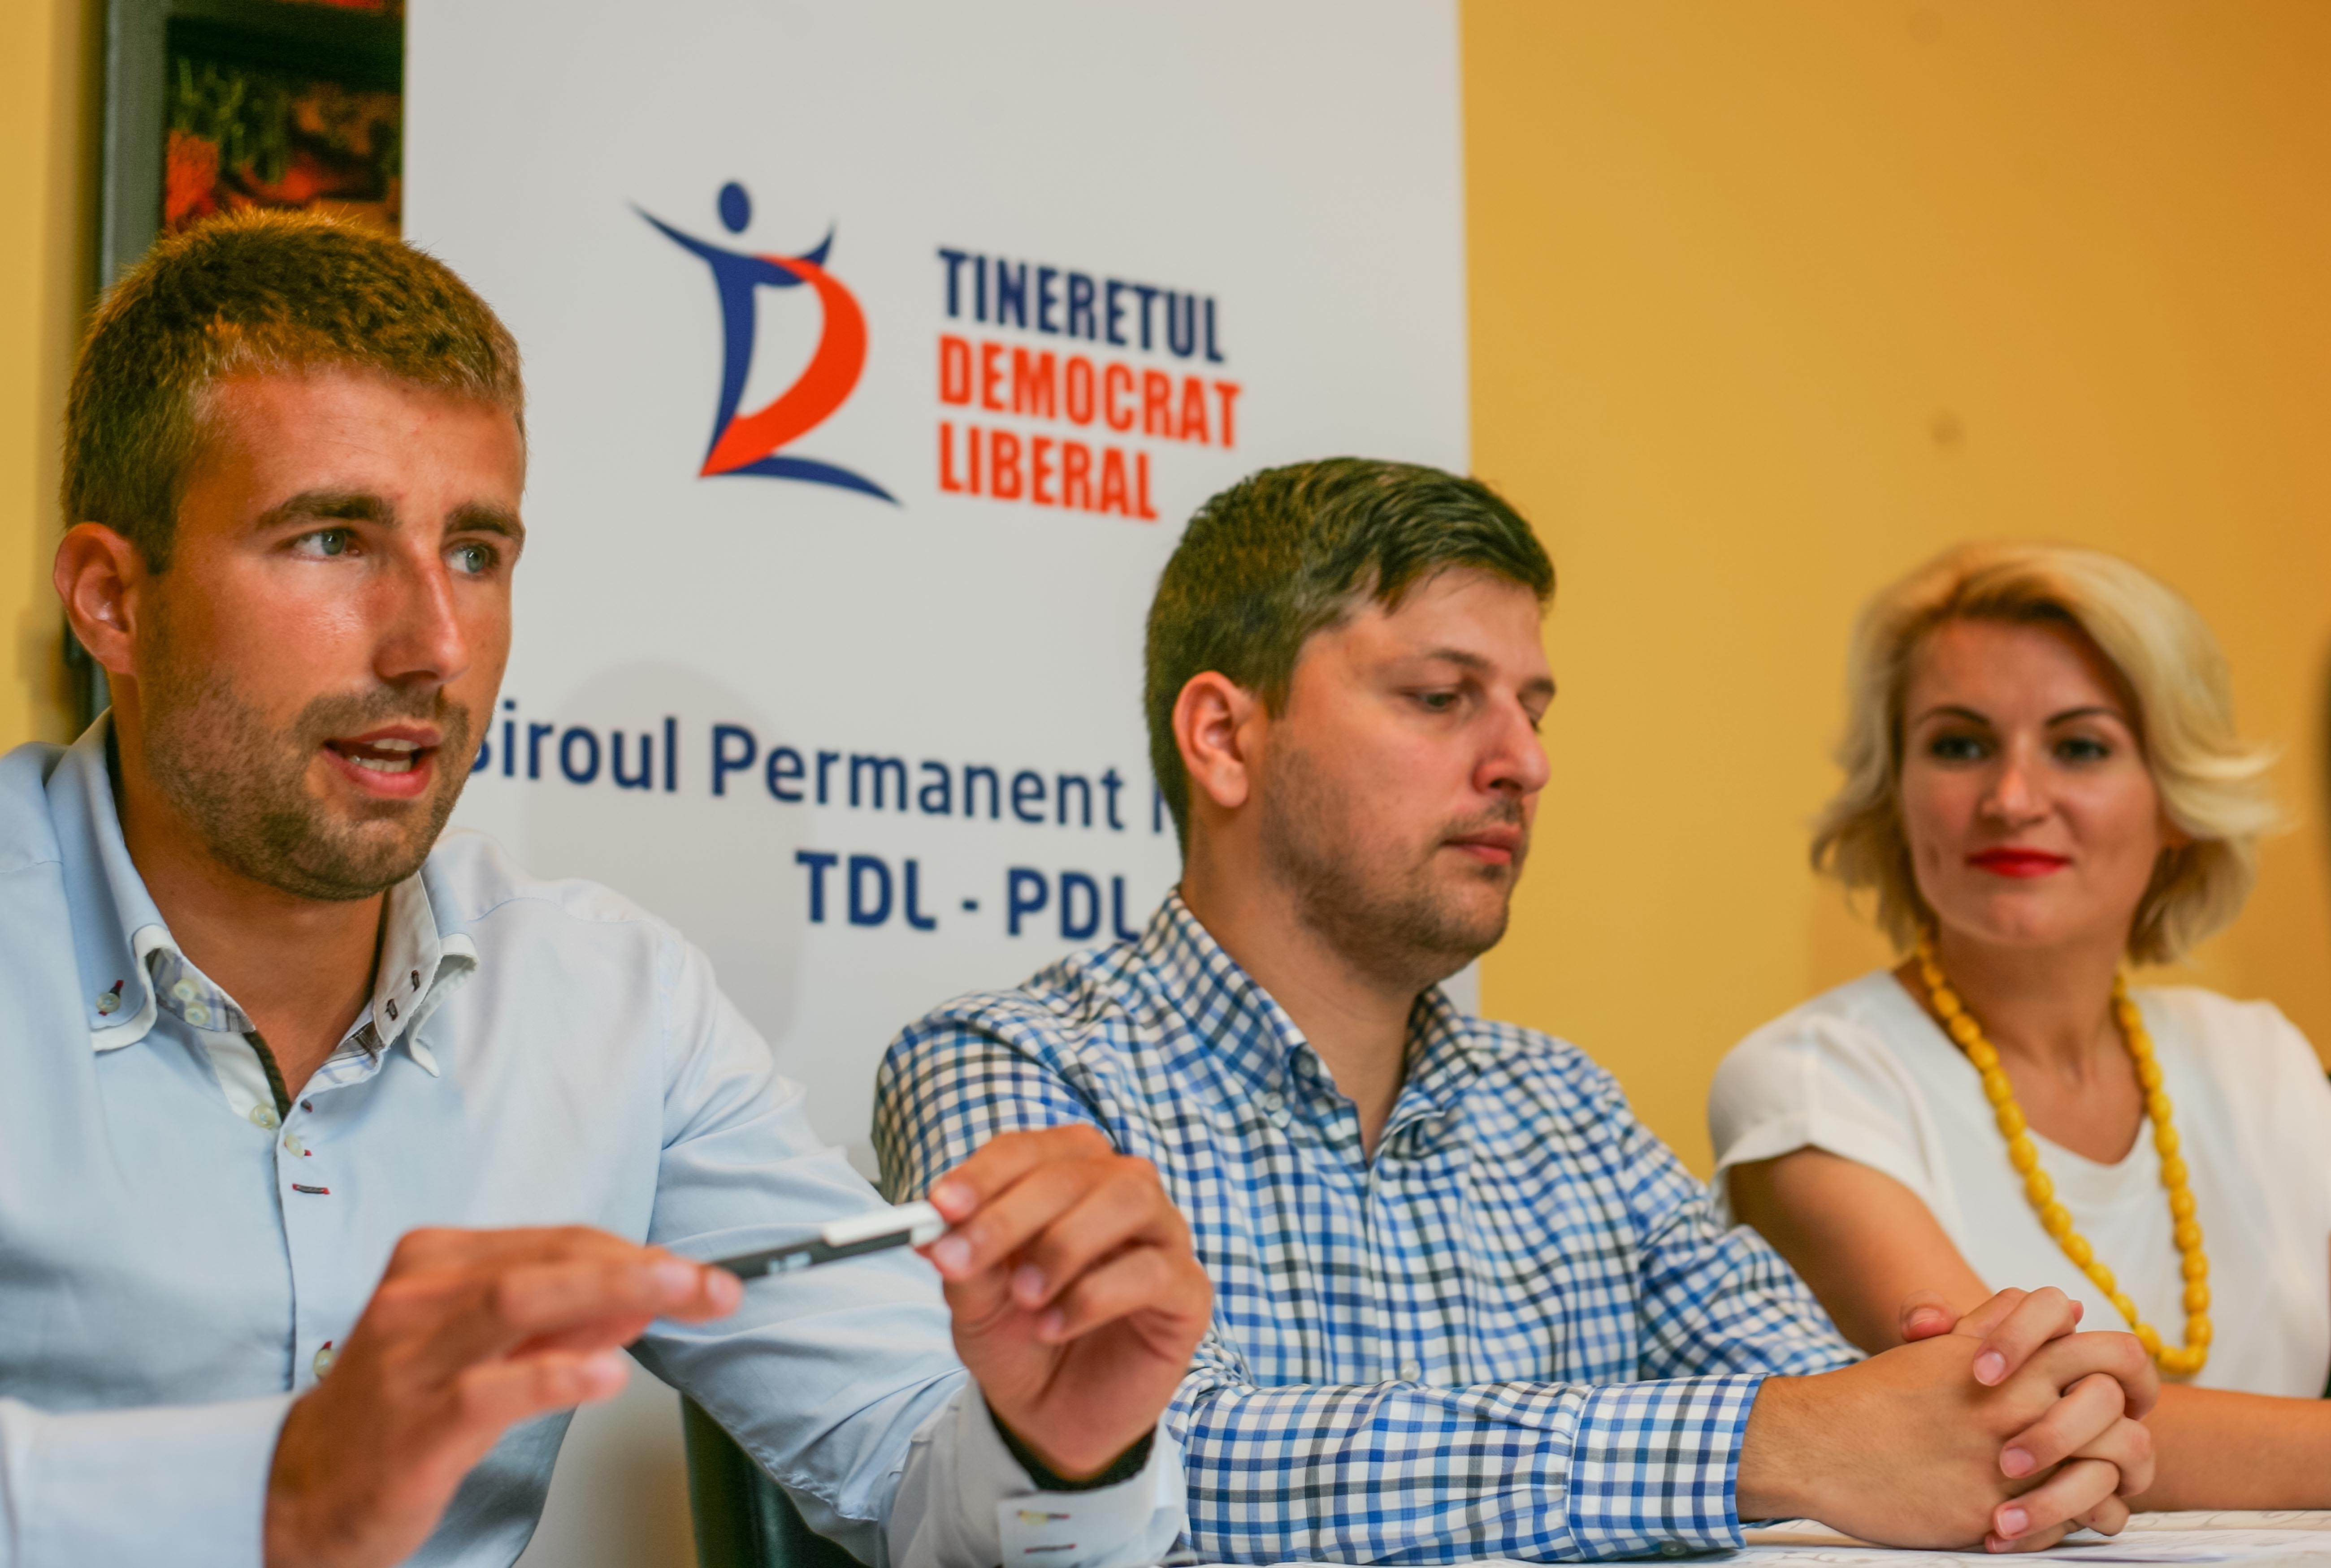 Avro Osmailovici, Sorin Moldovan, Andreea3